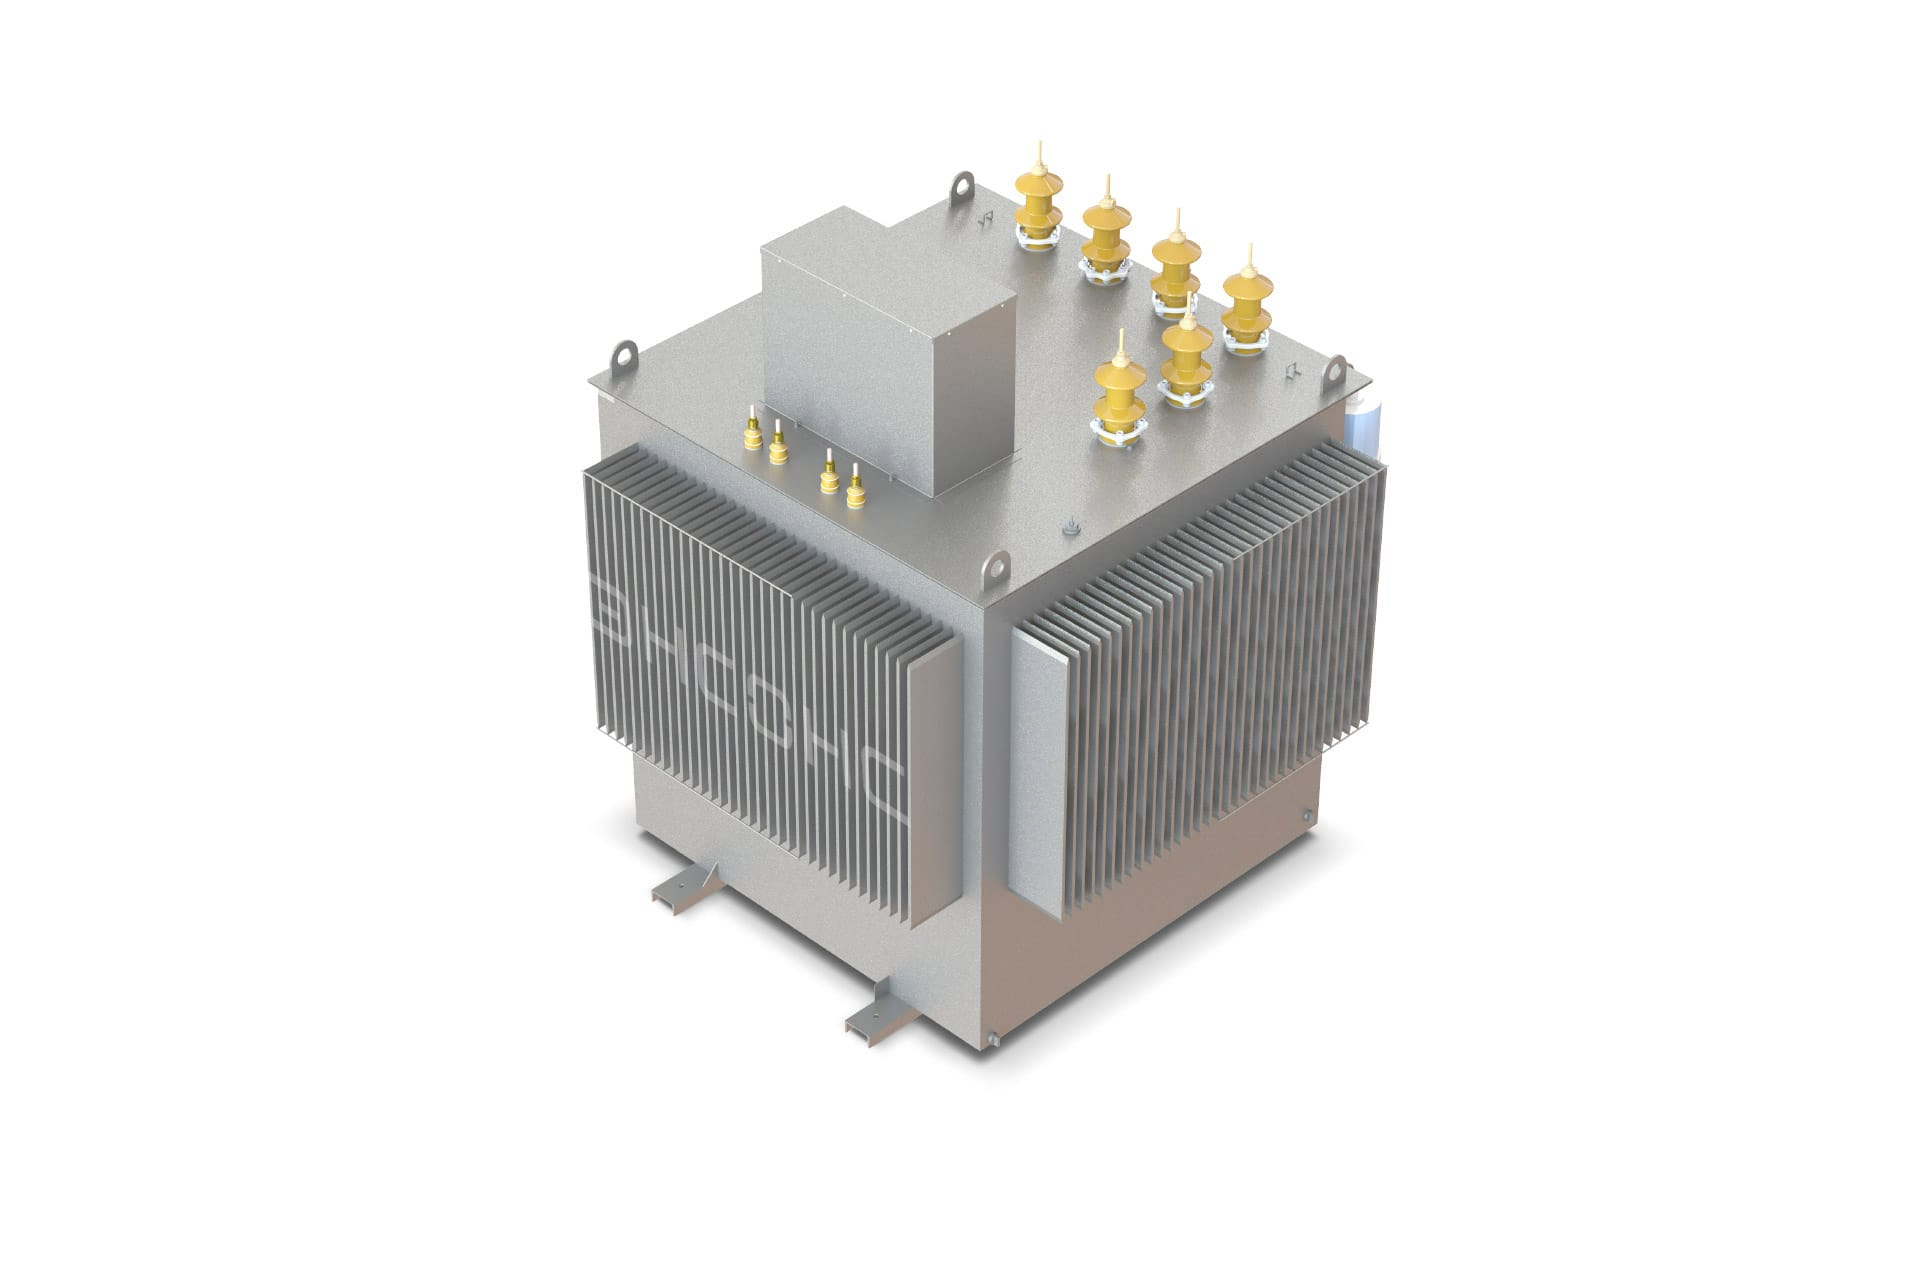 Ensons - Общий вид агрегата АЗДПМ (конструкторский рендер)